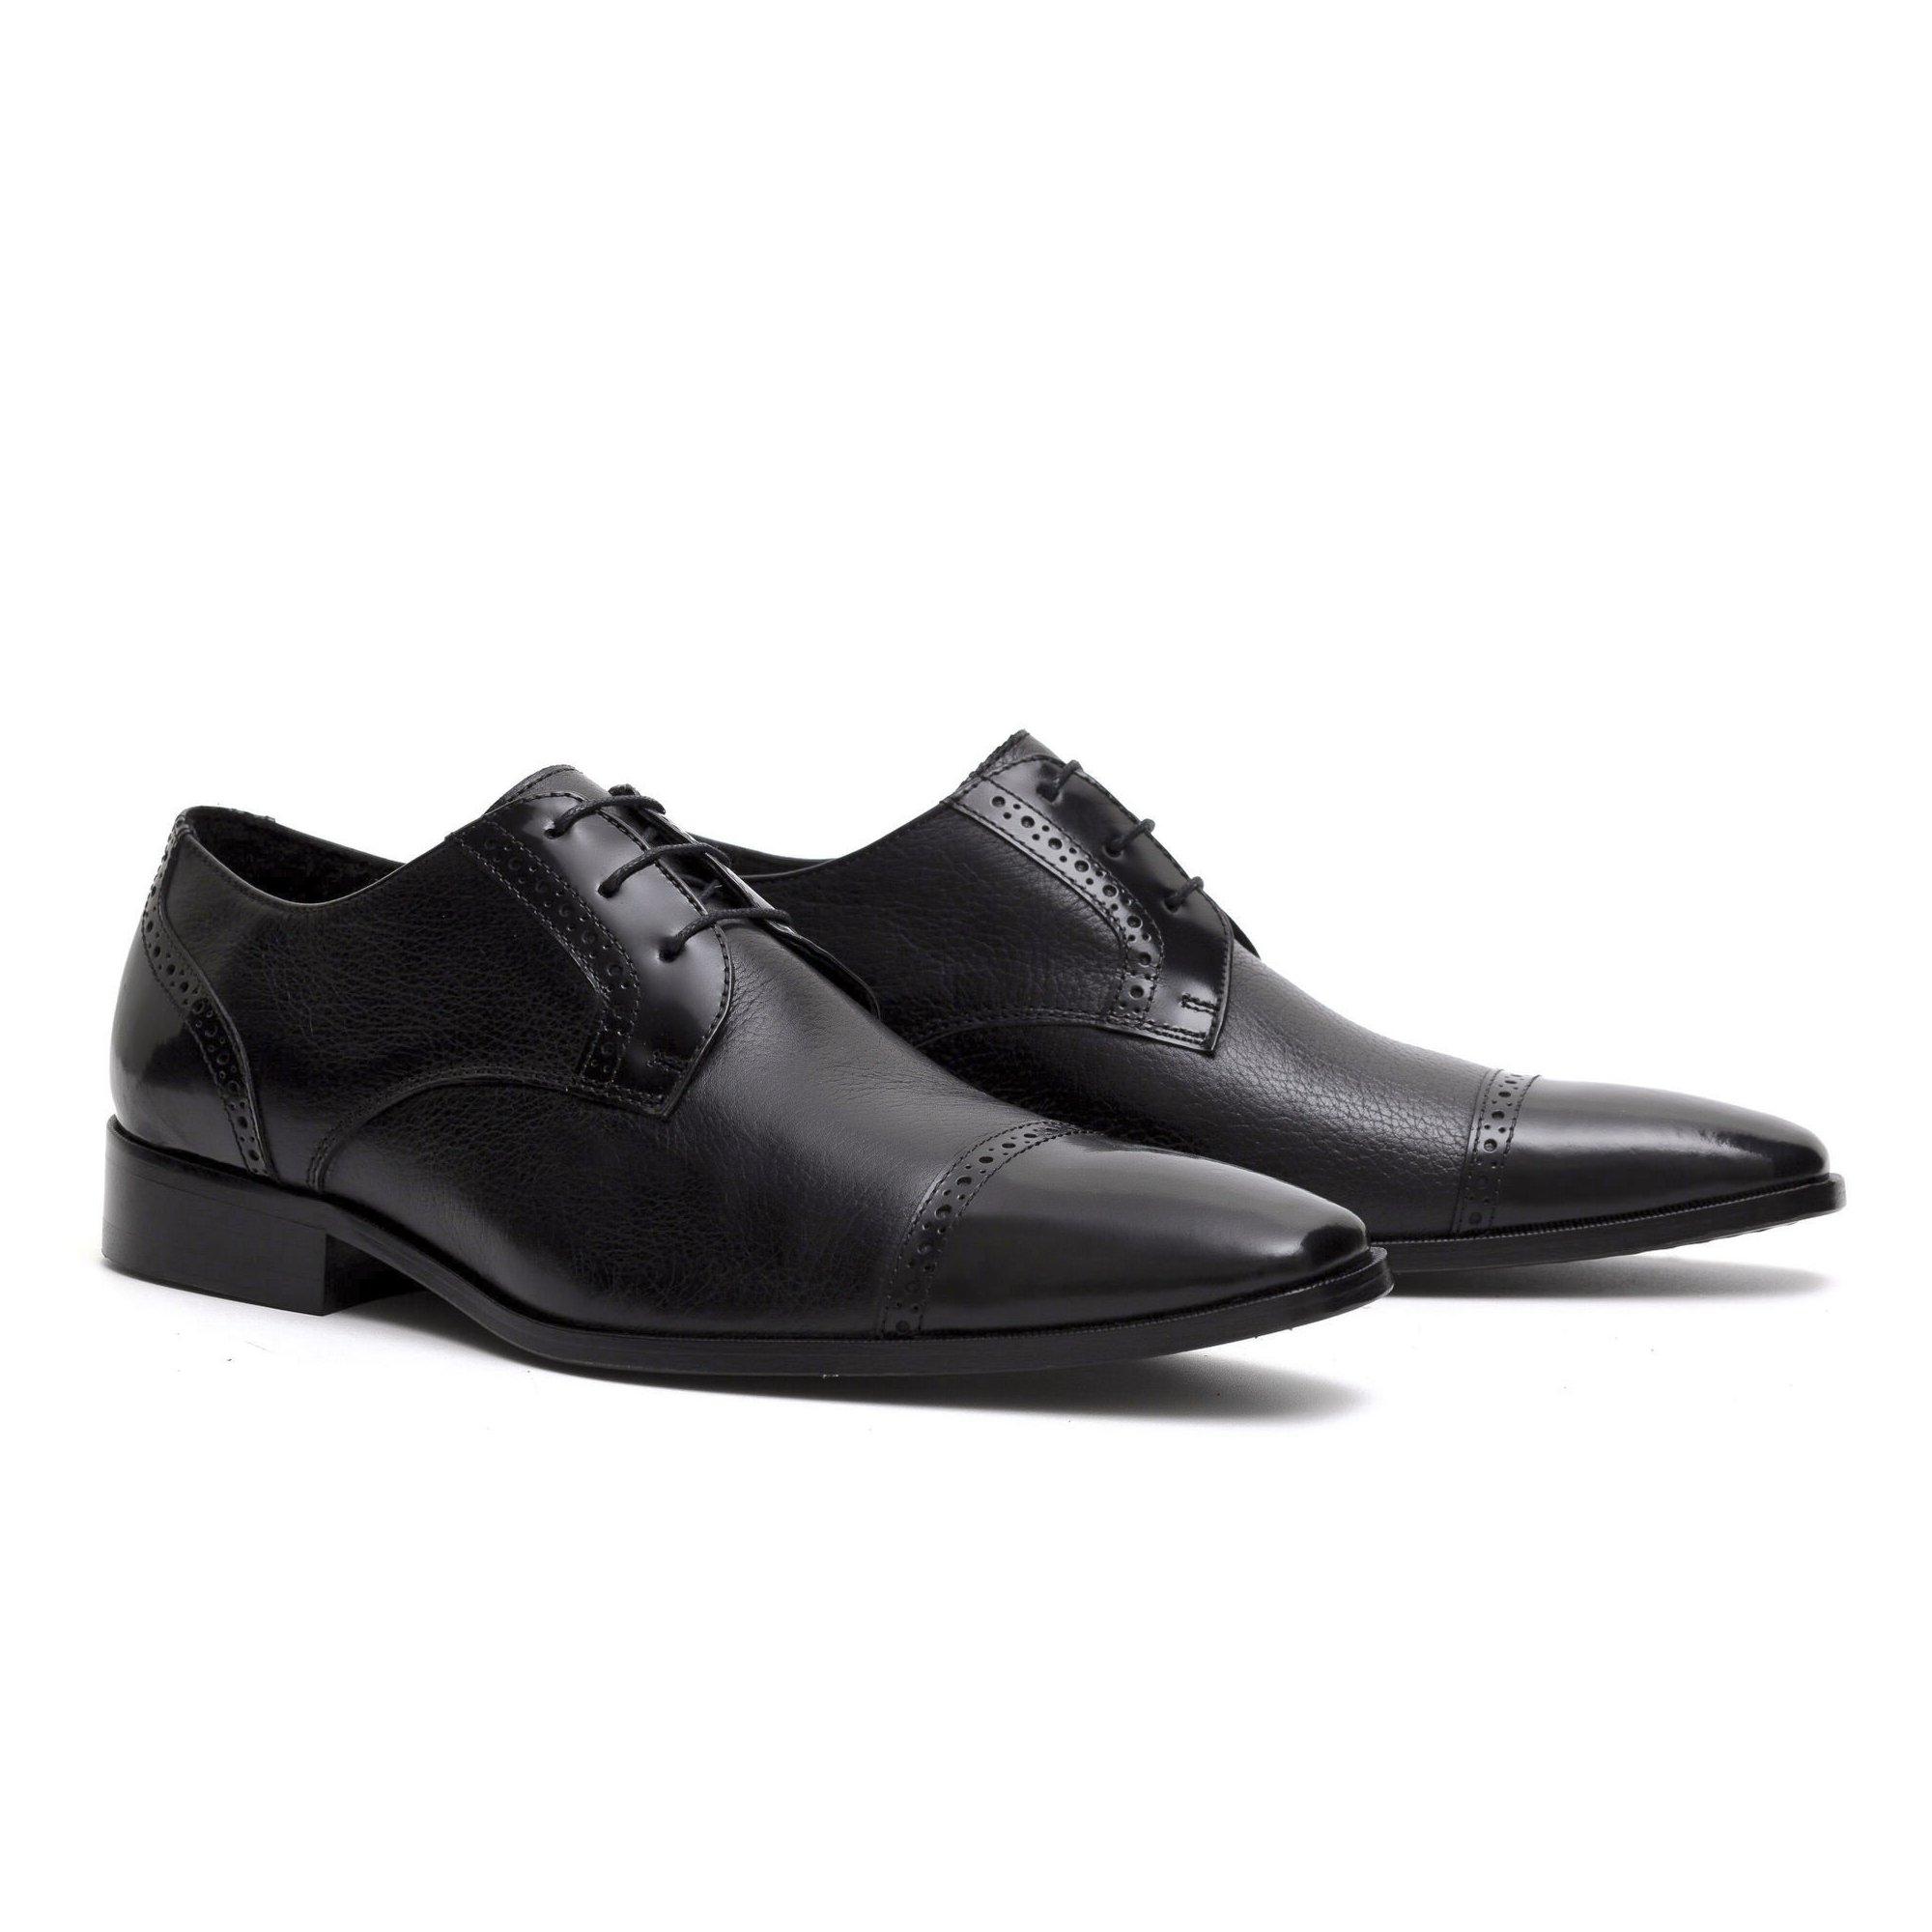 Sapato Social Masculino Preto Couro Legítimo Monbran Dressy 032301P